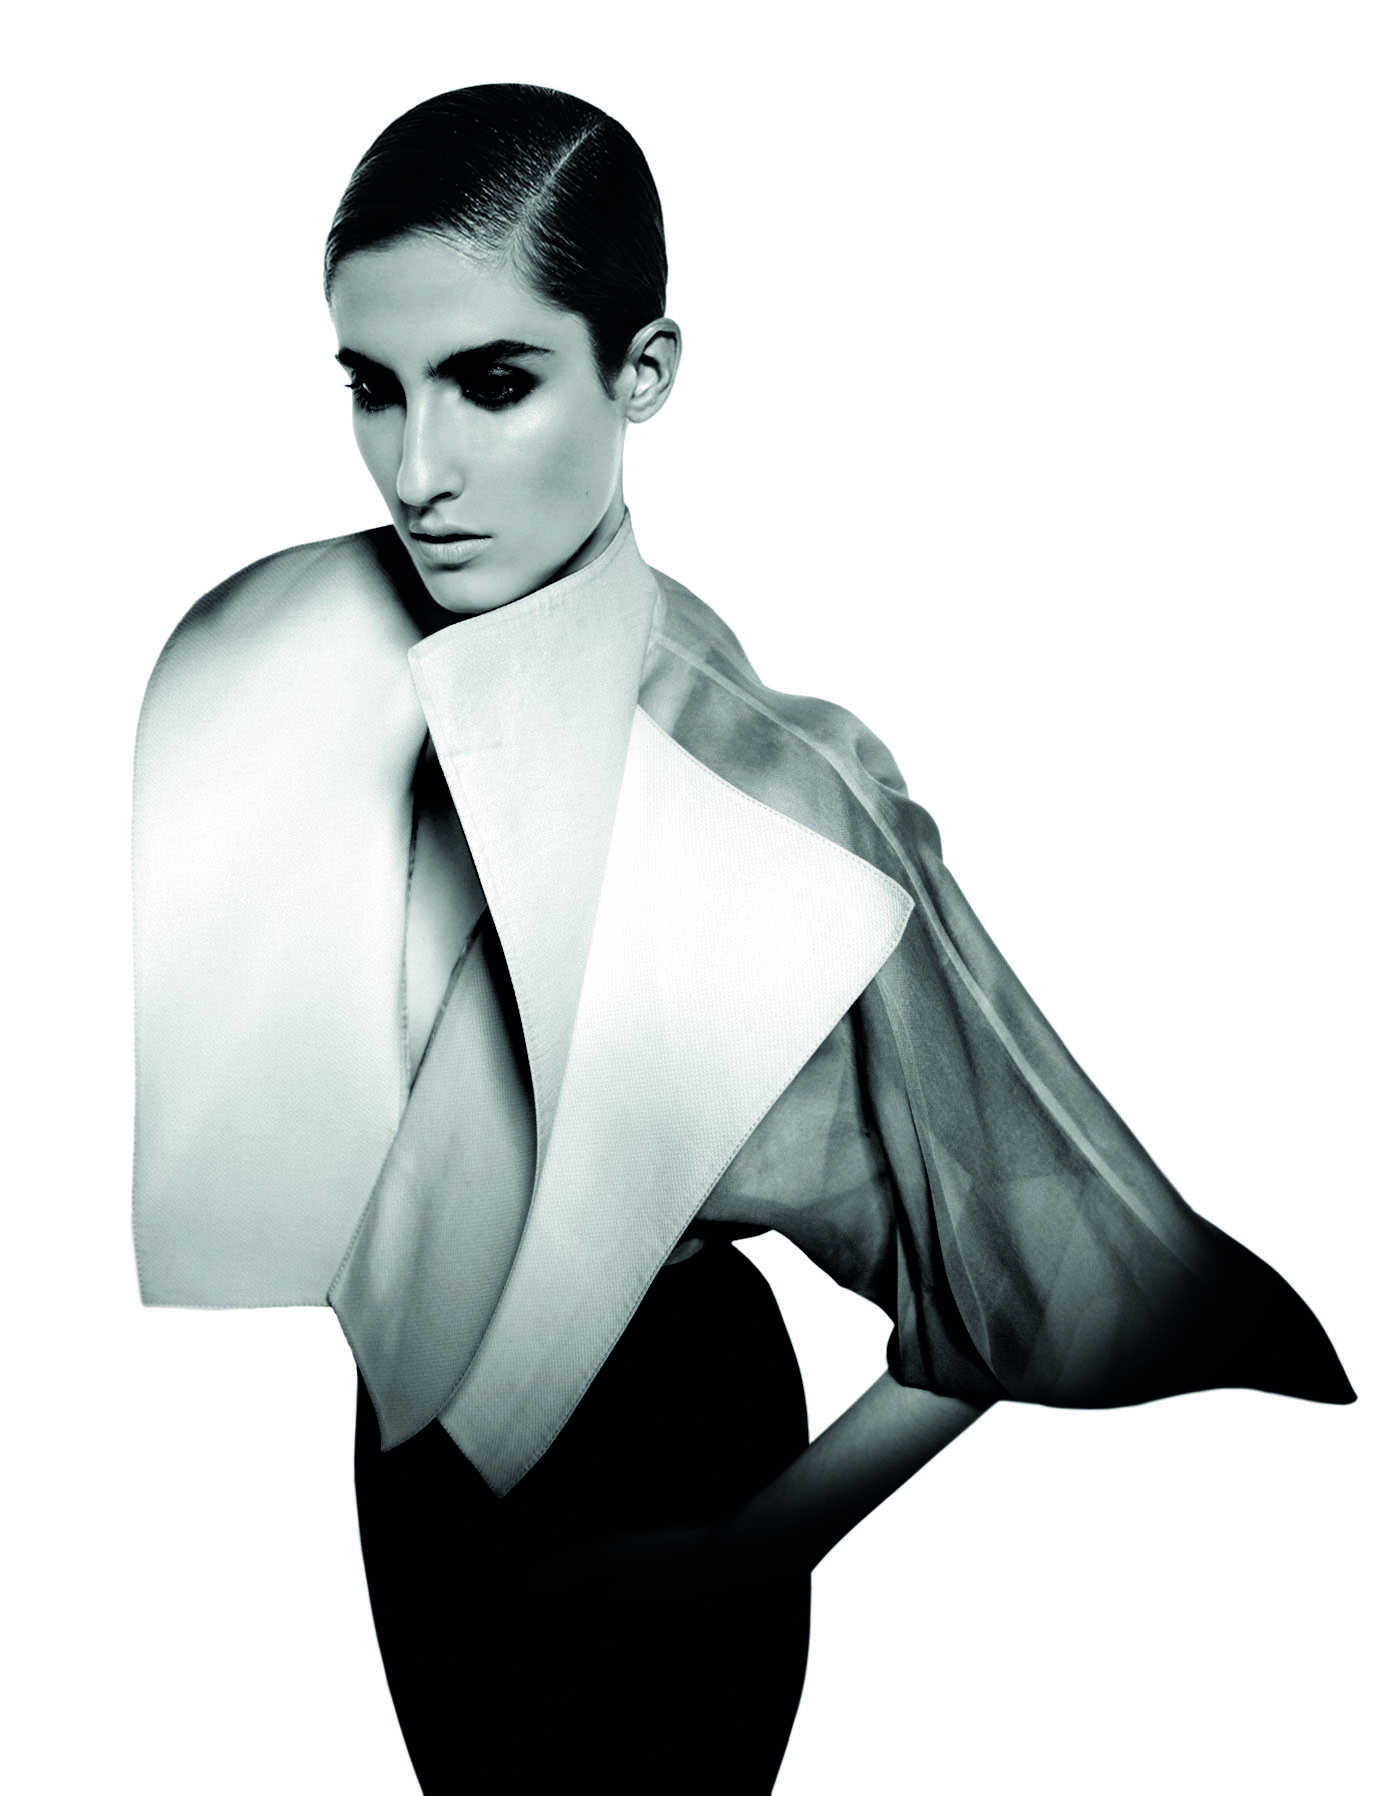 'Sailor Glam' shirt, Gianfranco Ferré Spring/Summer 1982 collection (Photography Luca Stoppini)